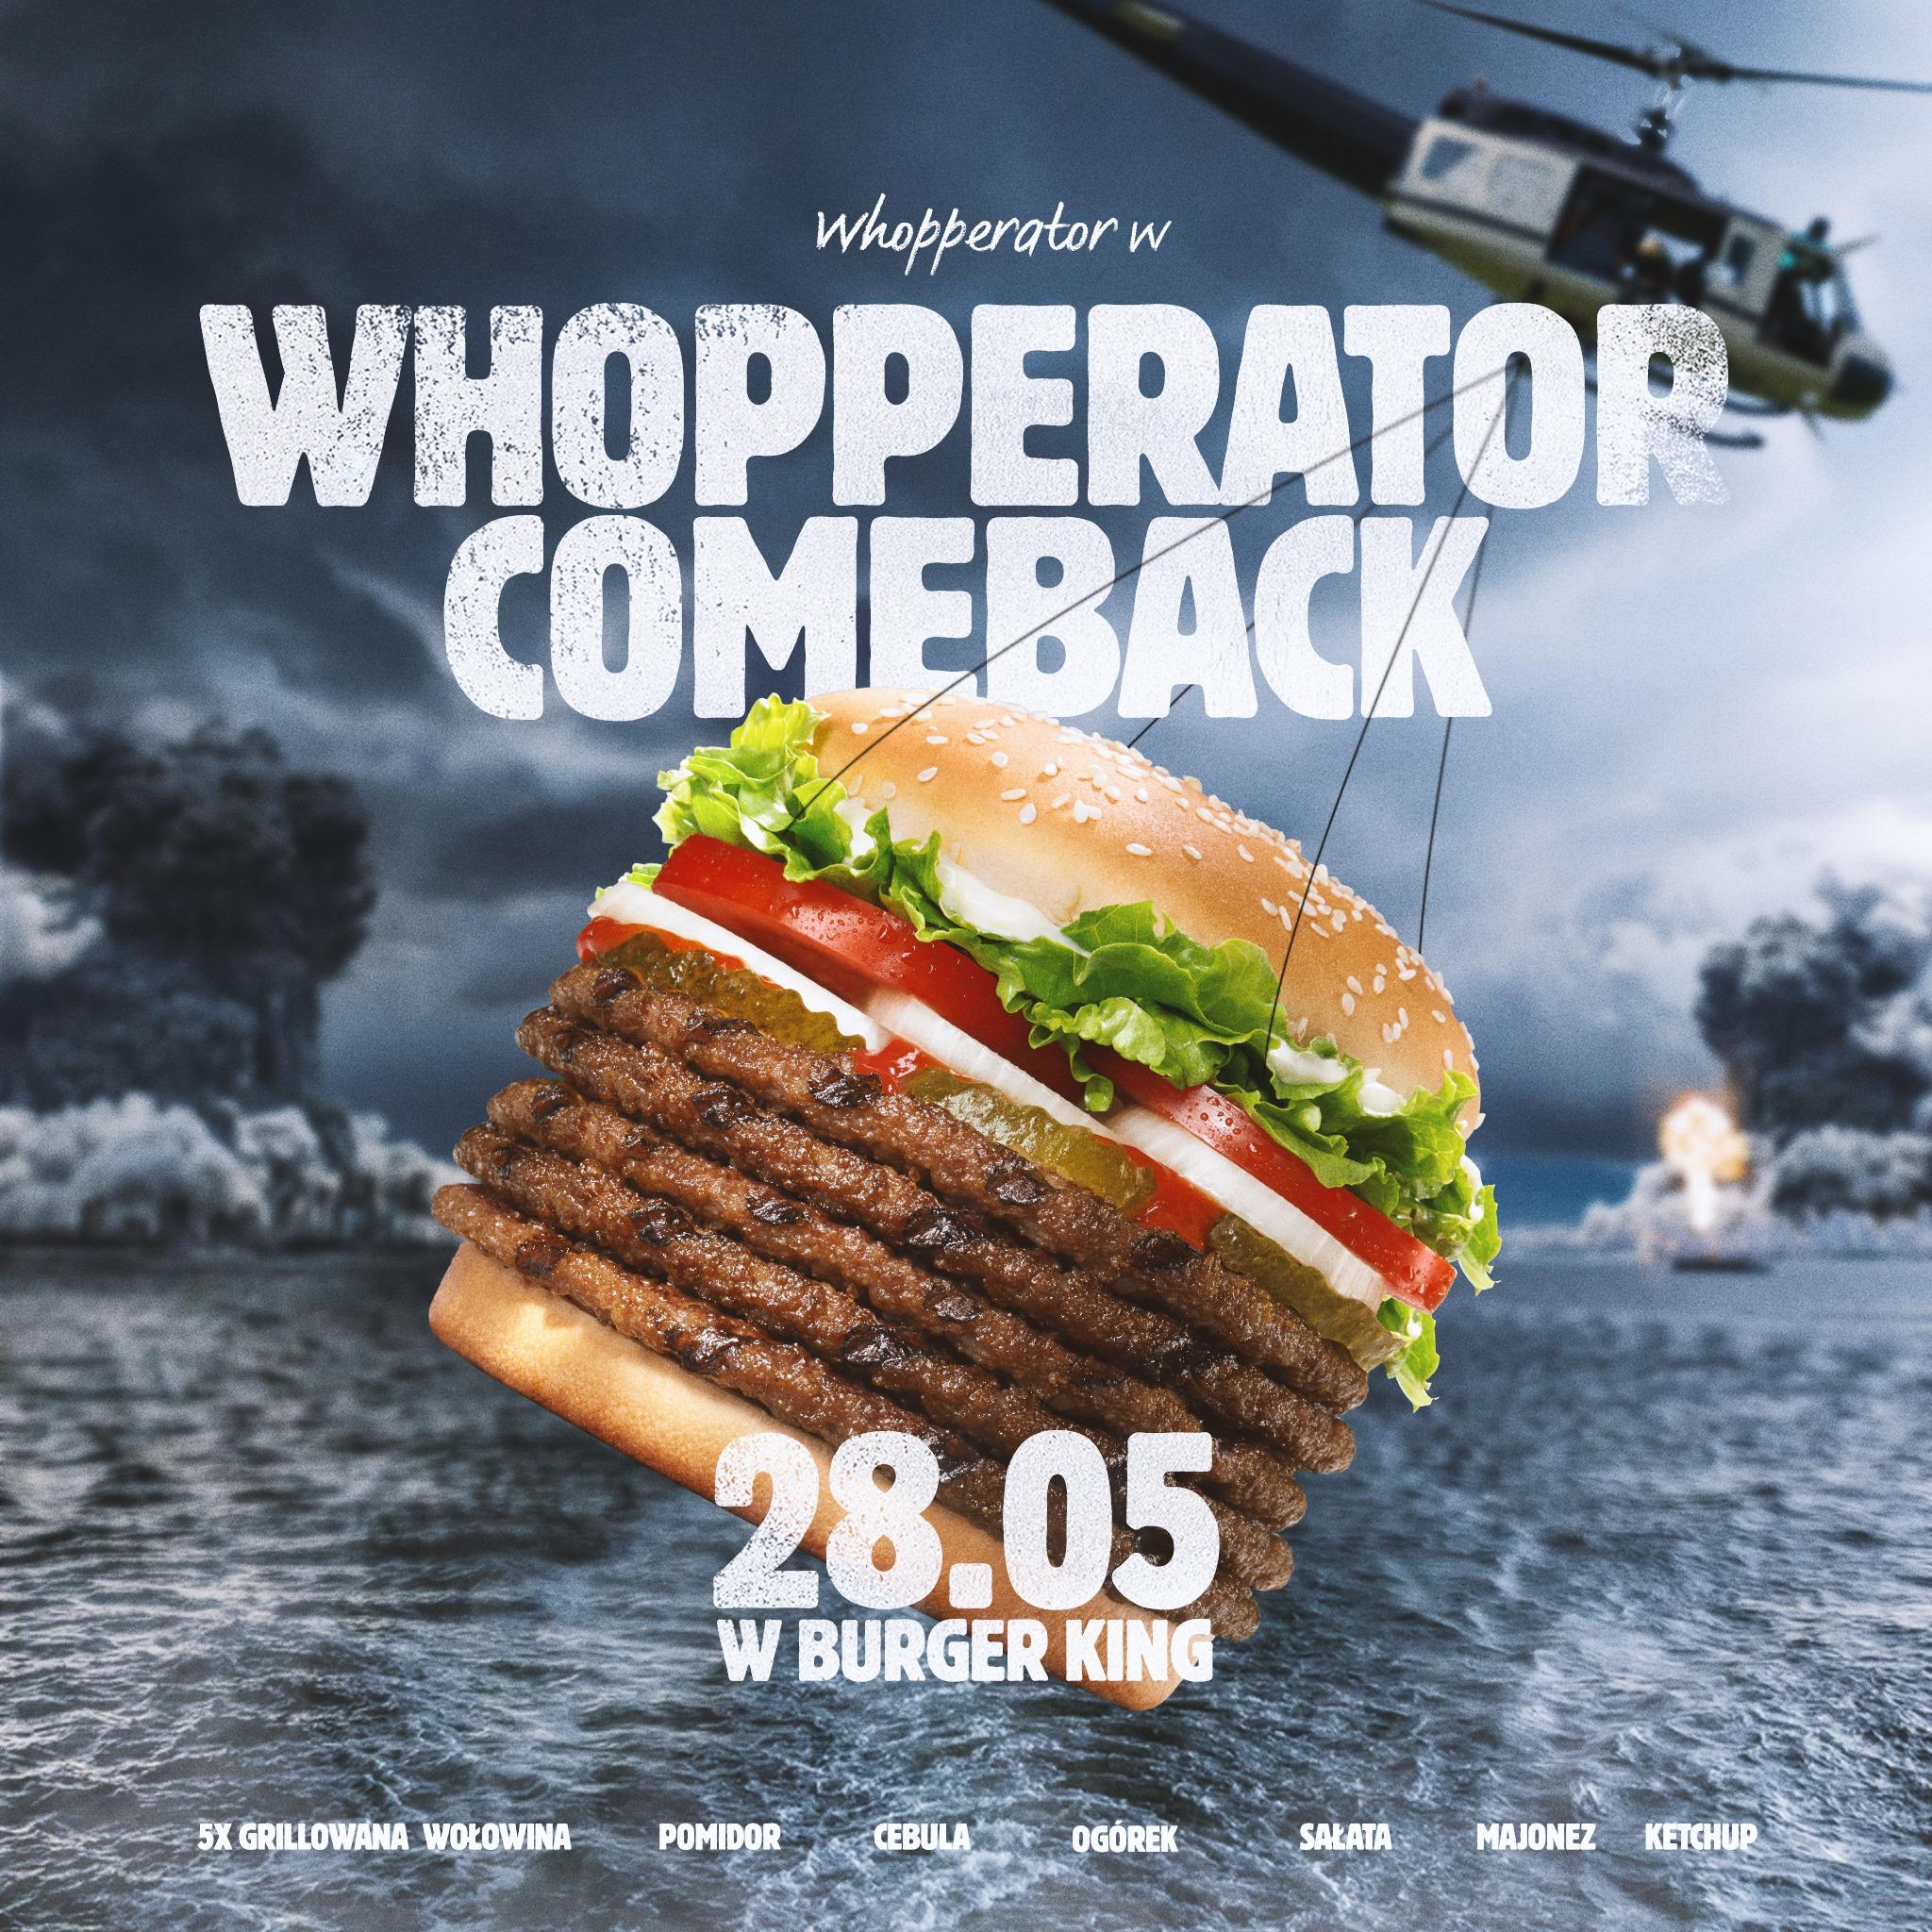 Whopperator, dzień burgera